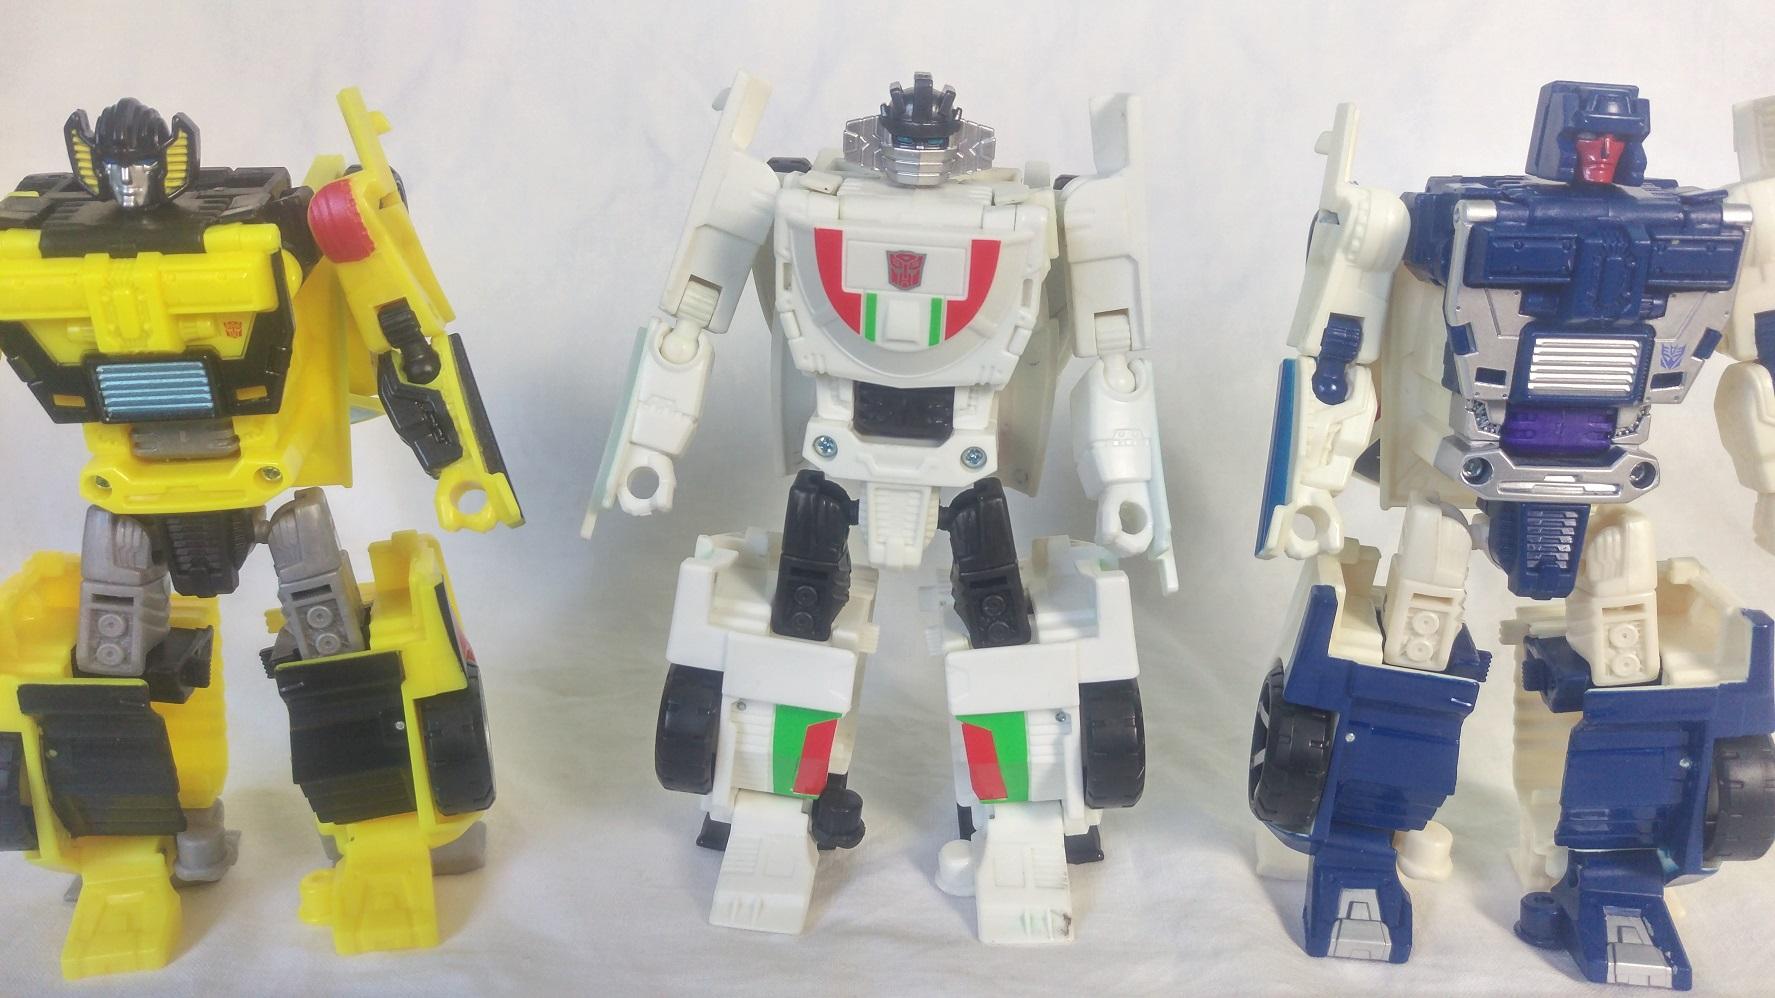 Combiner Wars Wheeljack In Hand Images Transformers News